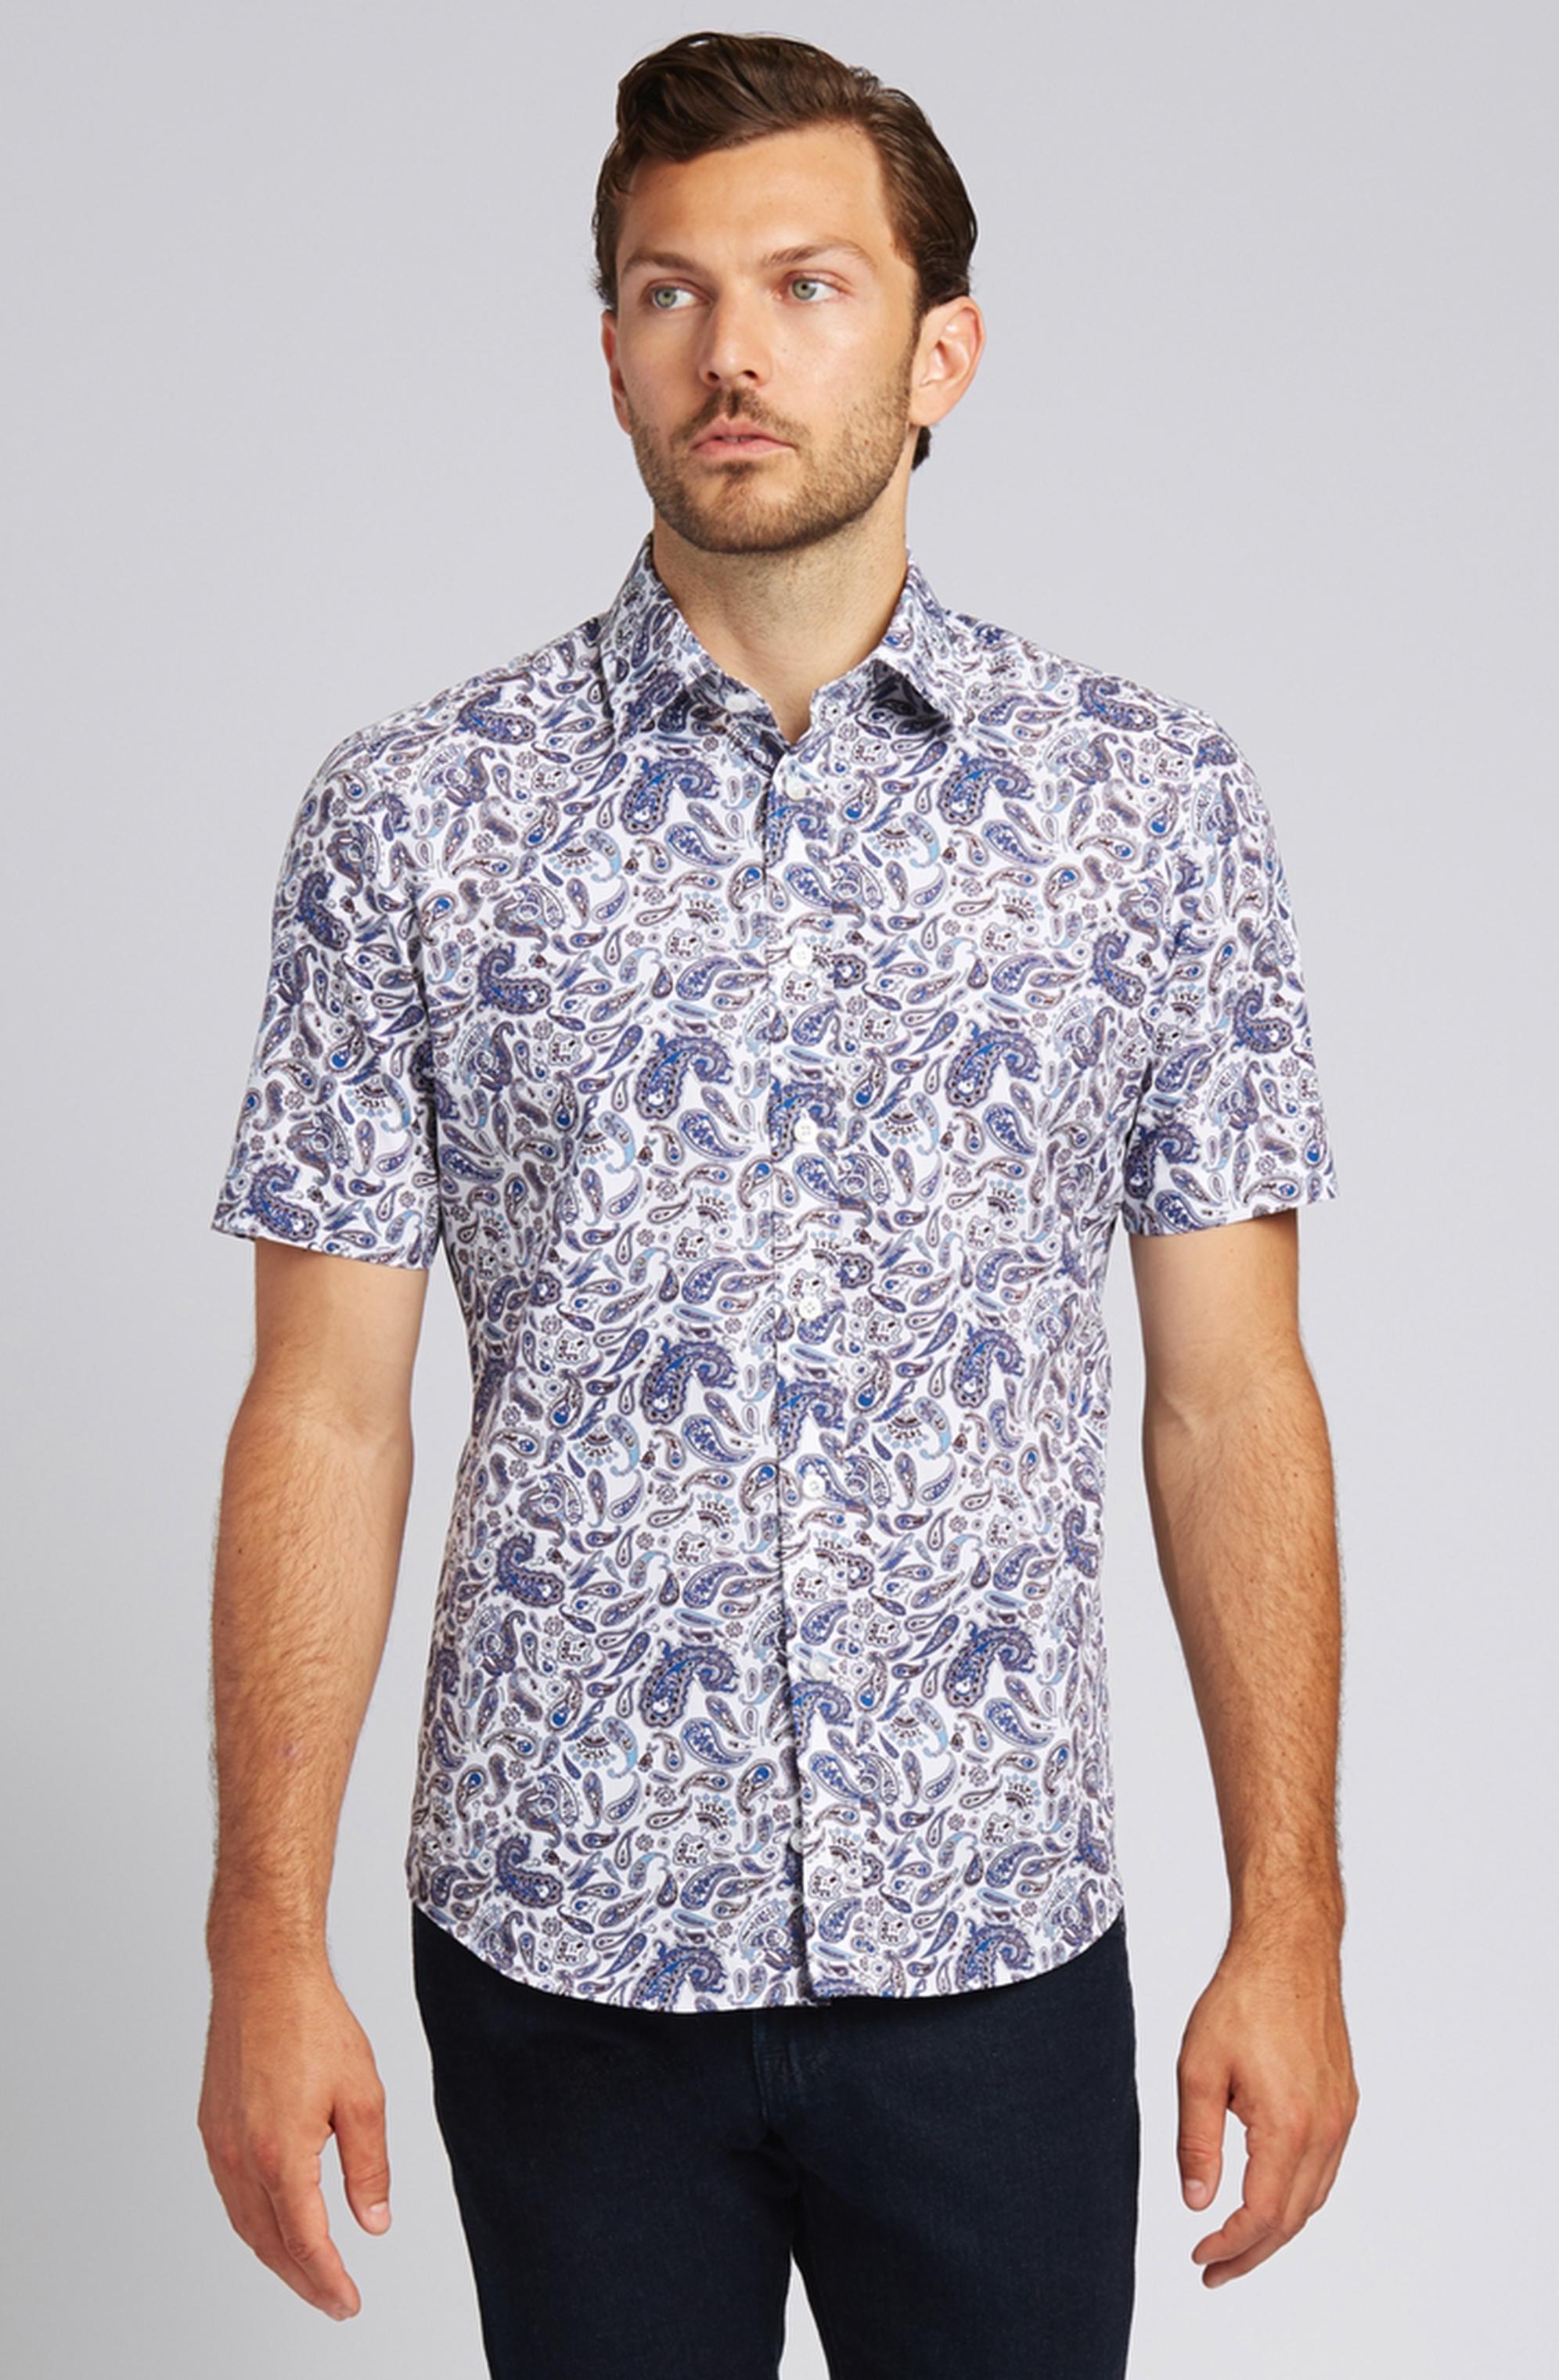 Blue Paisley Short-Sleeve Button-Front Shirt